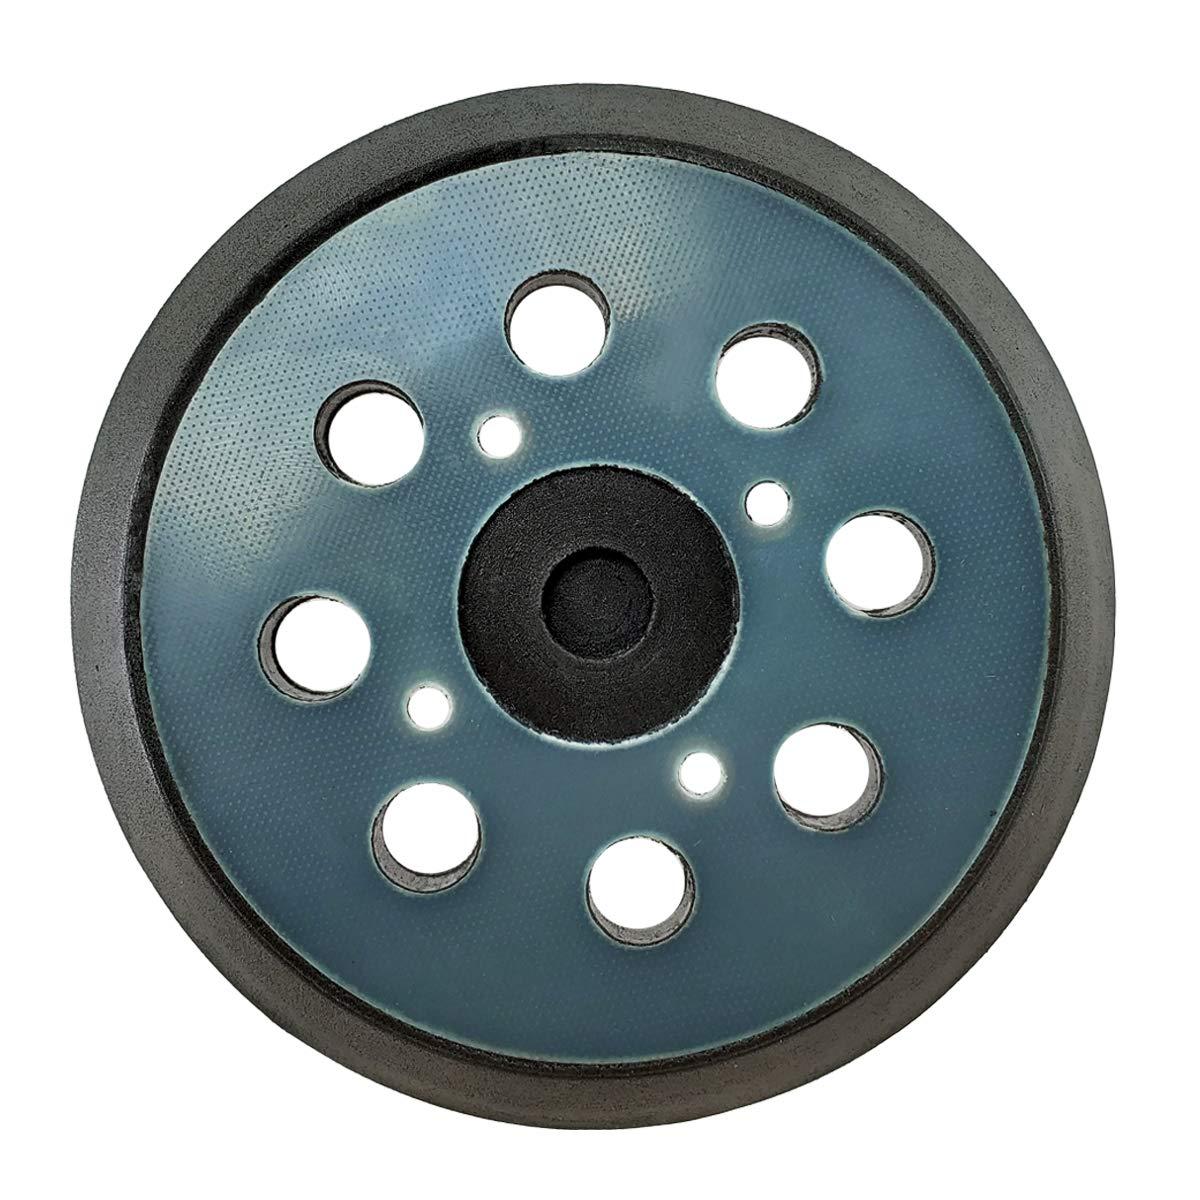 M-jump 5 Dia 8 Hole Hook /& Loop Backing Plate Pad Sander Replaces Pad for Milwaukee OE # 51-36-7090 974484001 975241002 Ridgid OE # 300527002 Ryobi OE # 300527002